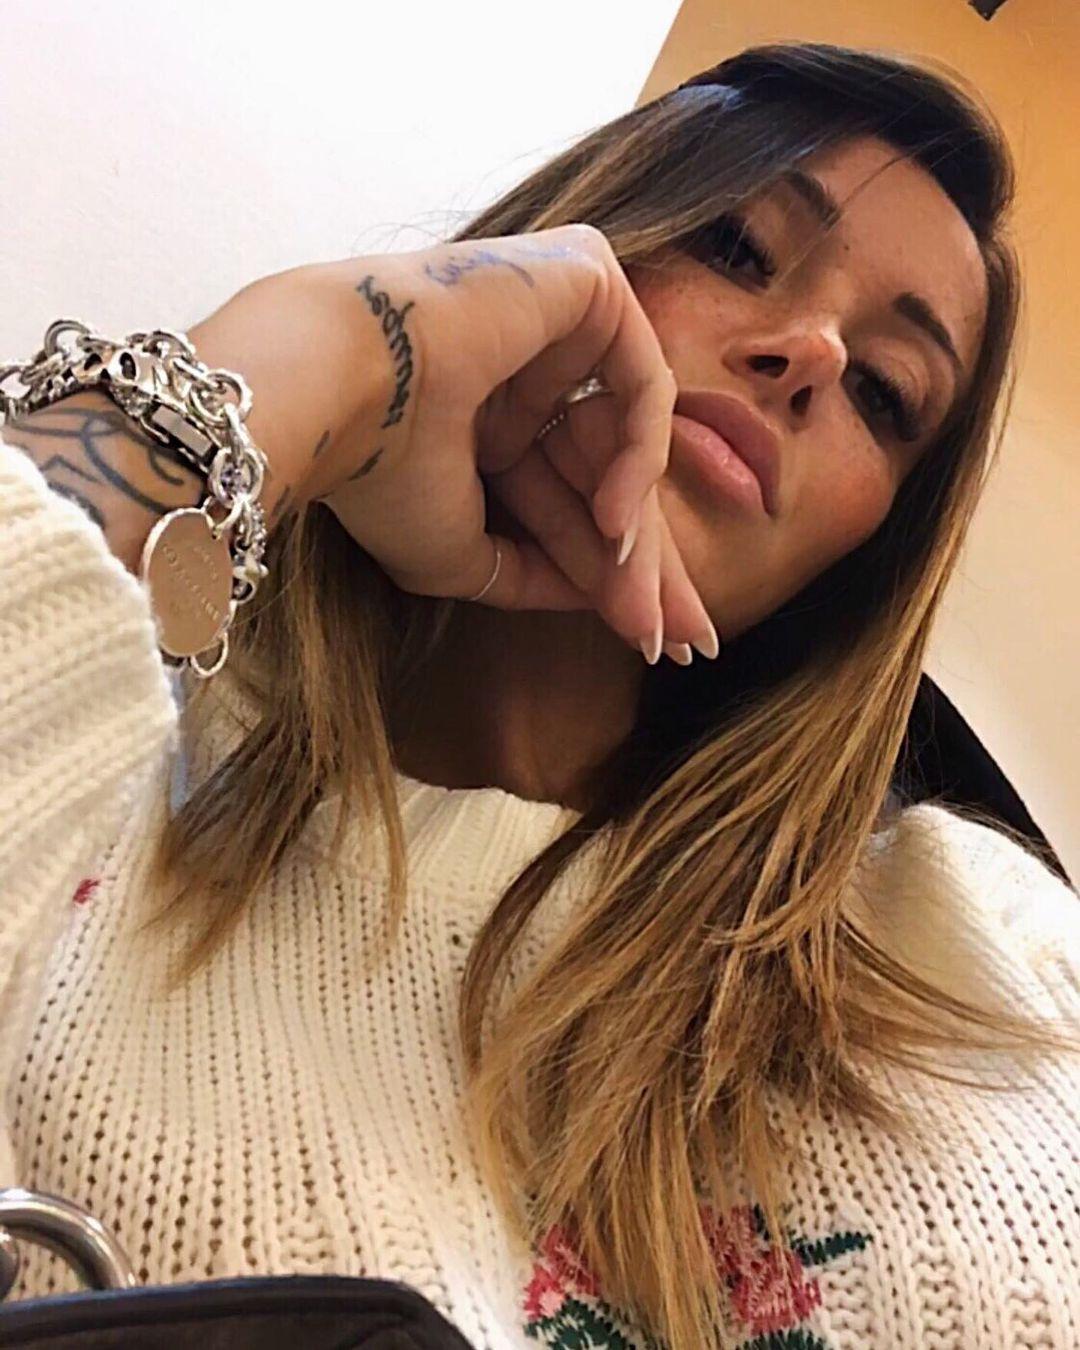 Francesca-Lannuario-Melillo-Wallpapers-Insta-Fit-Bio-1